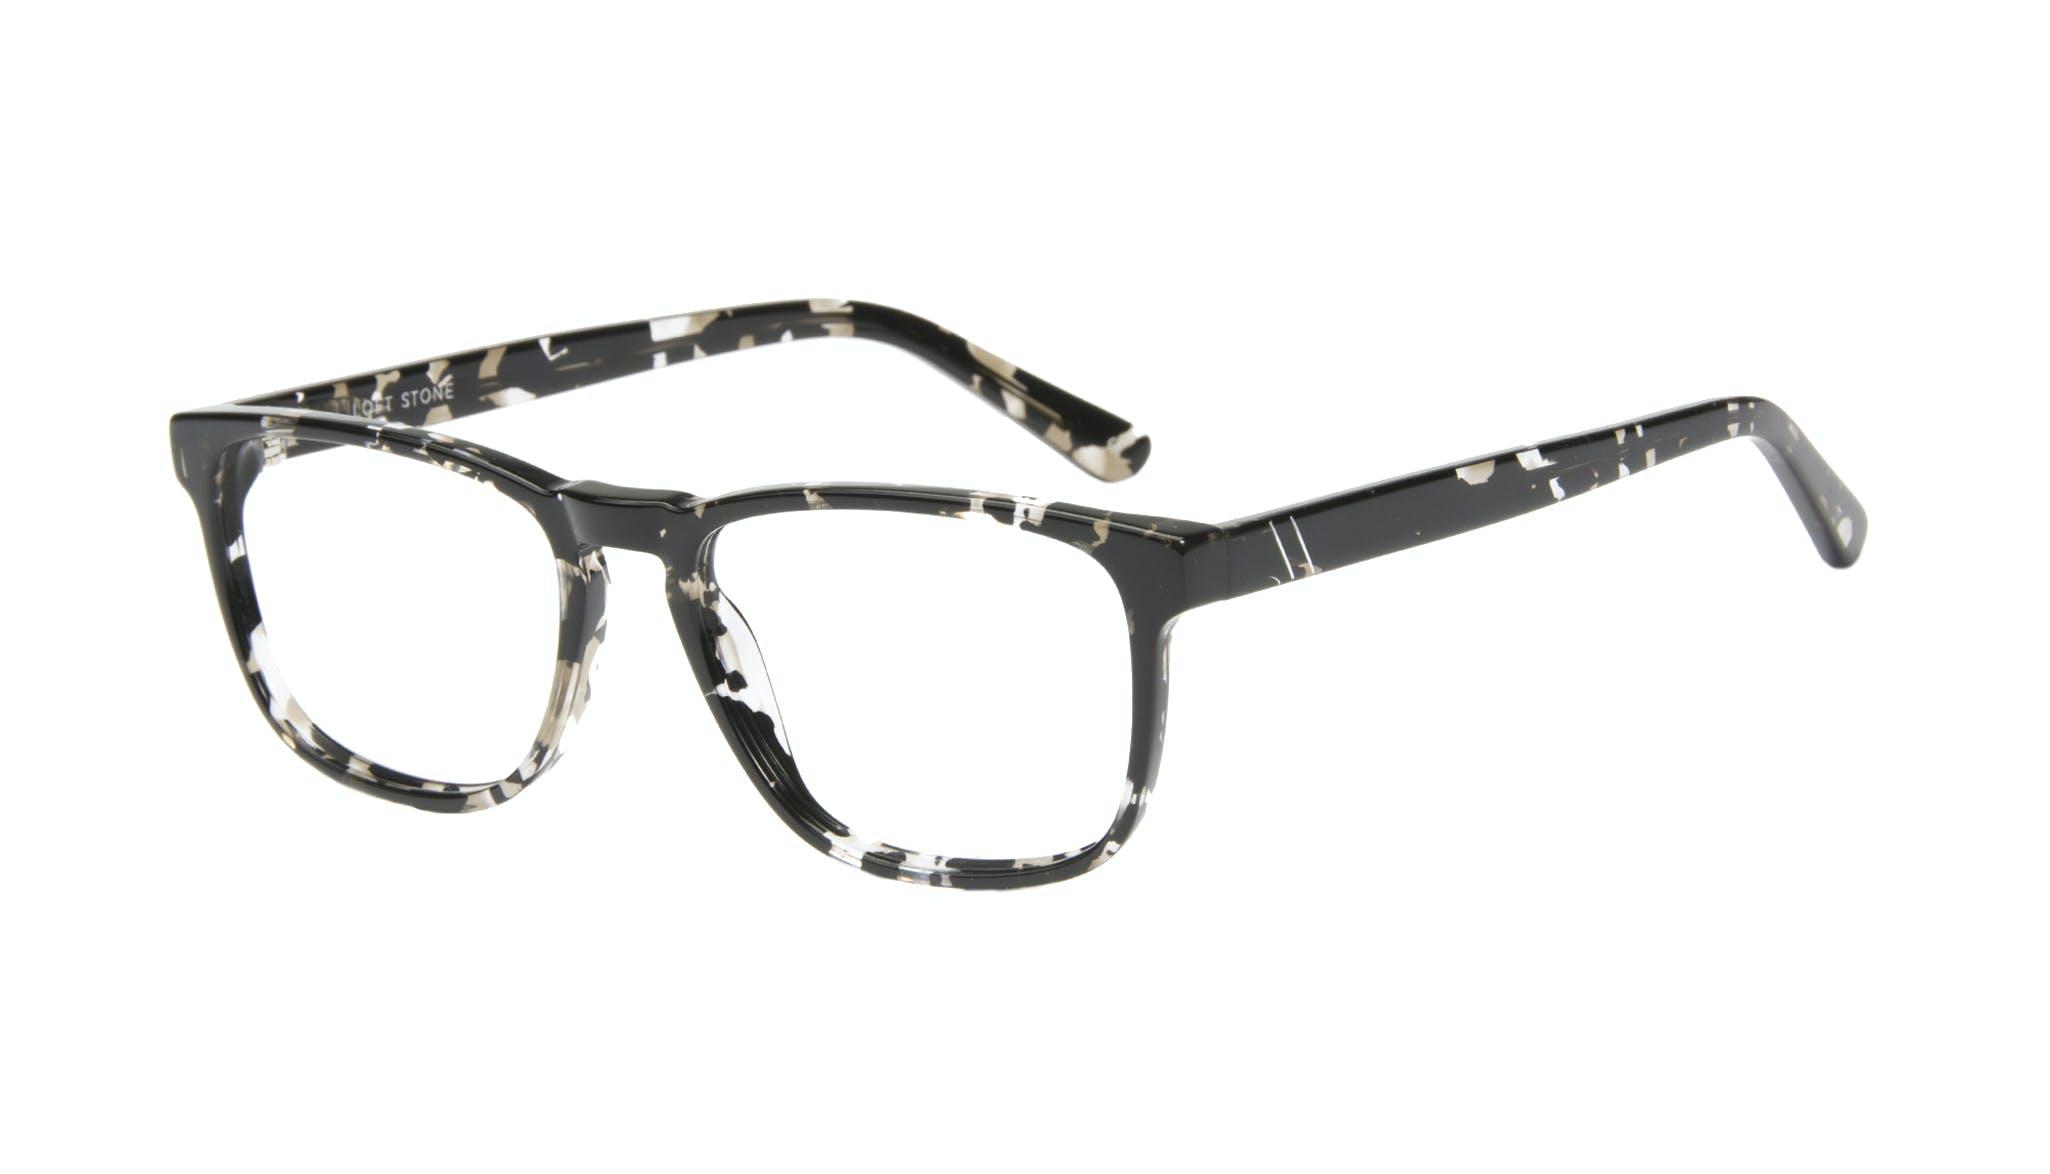 Affordable Fashion Glasses Rectangle Eyeglasses Men Loft Stone Tilt